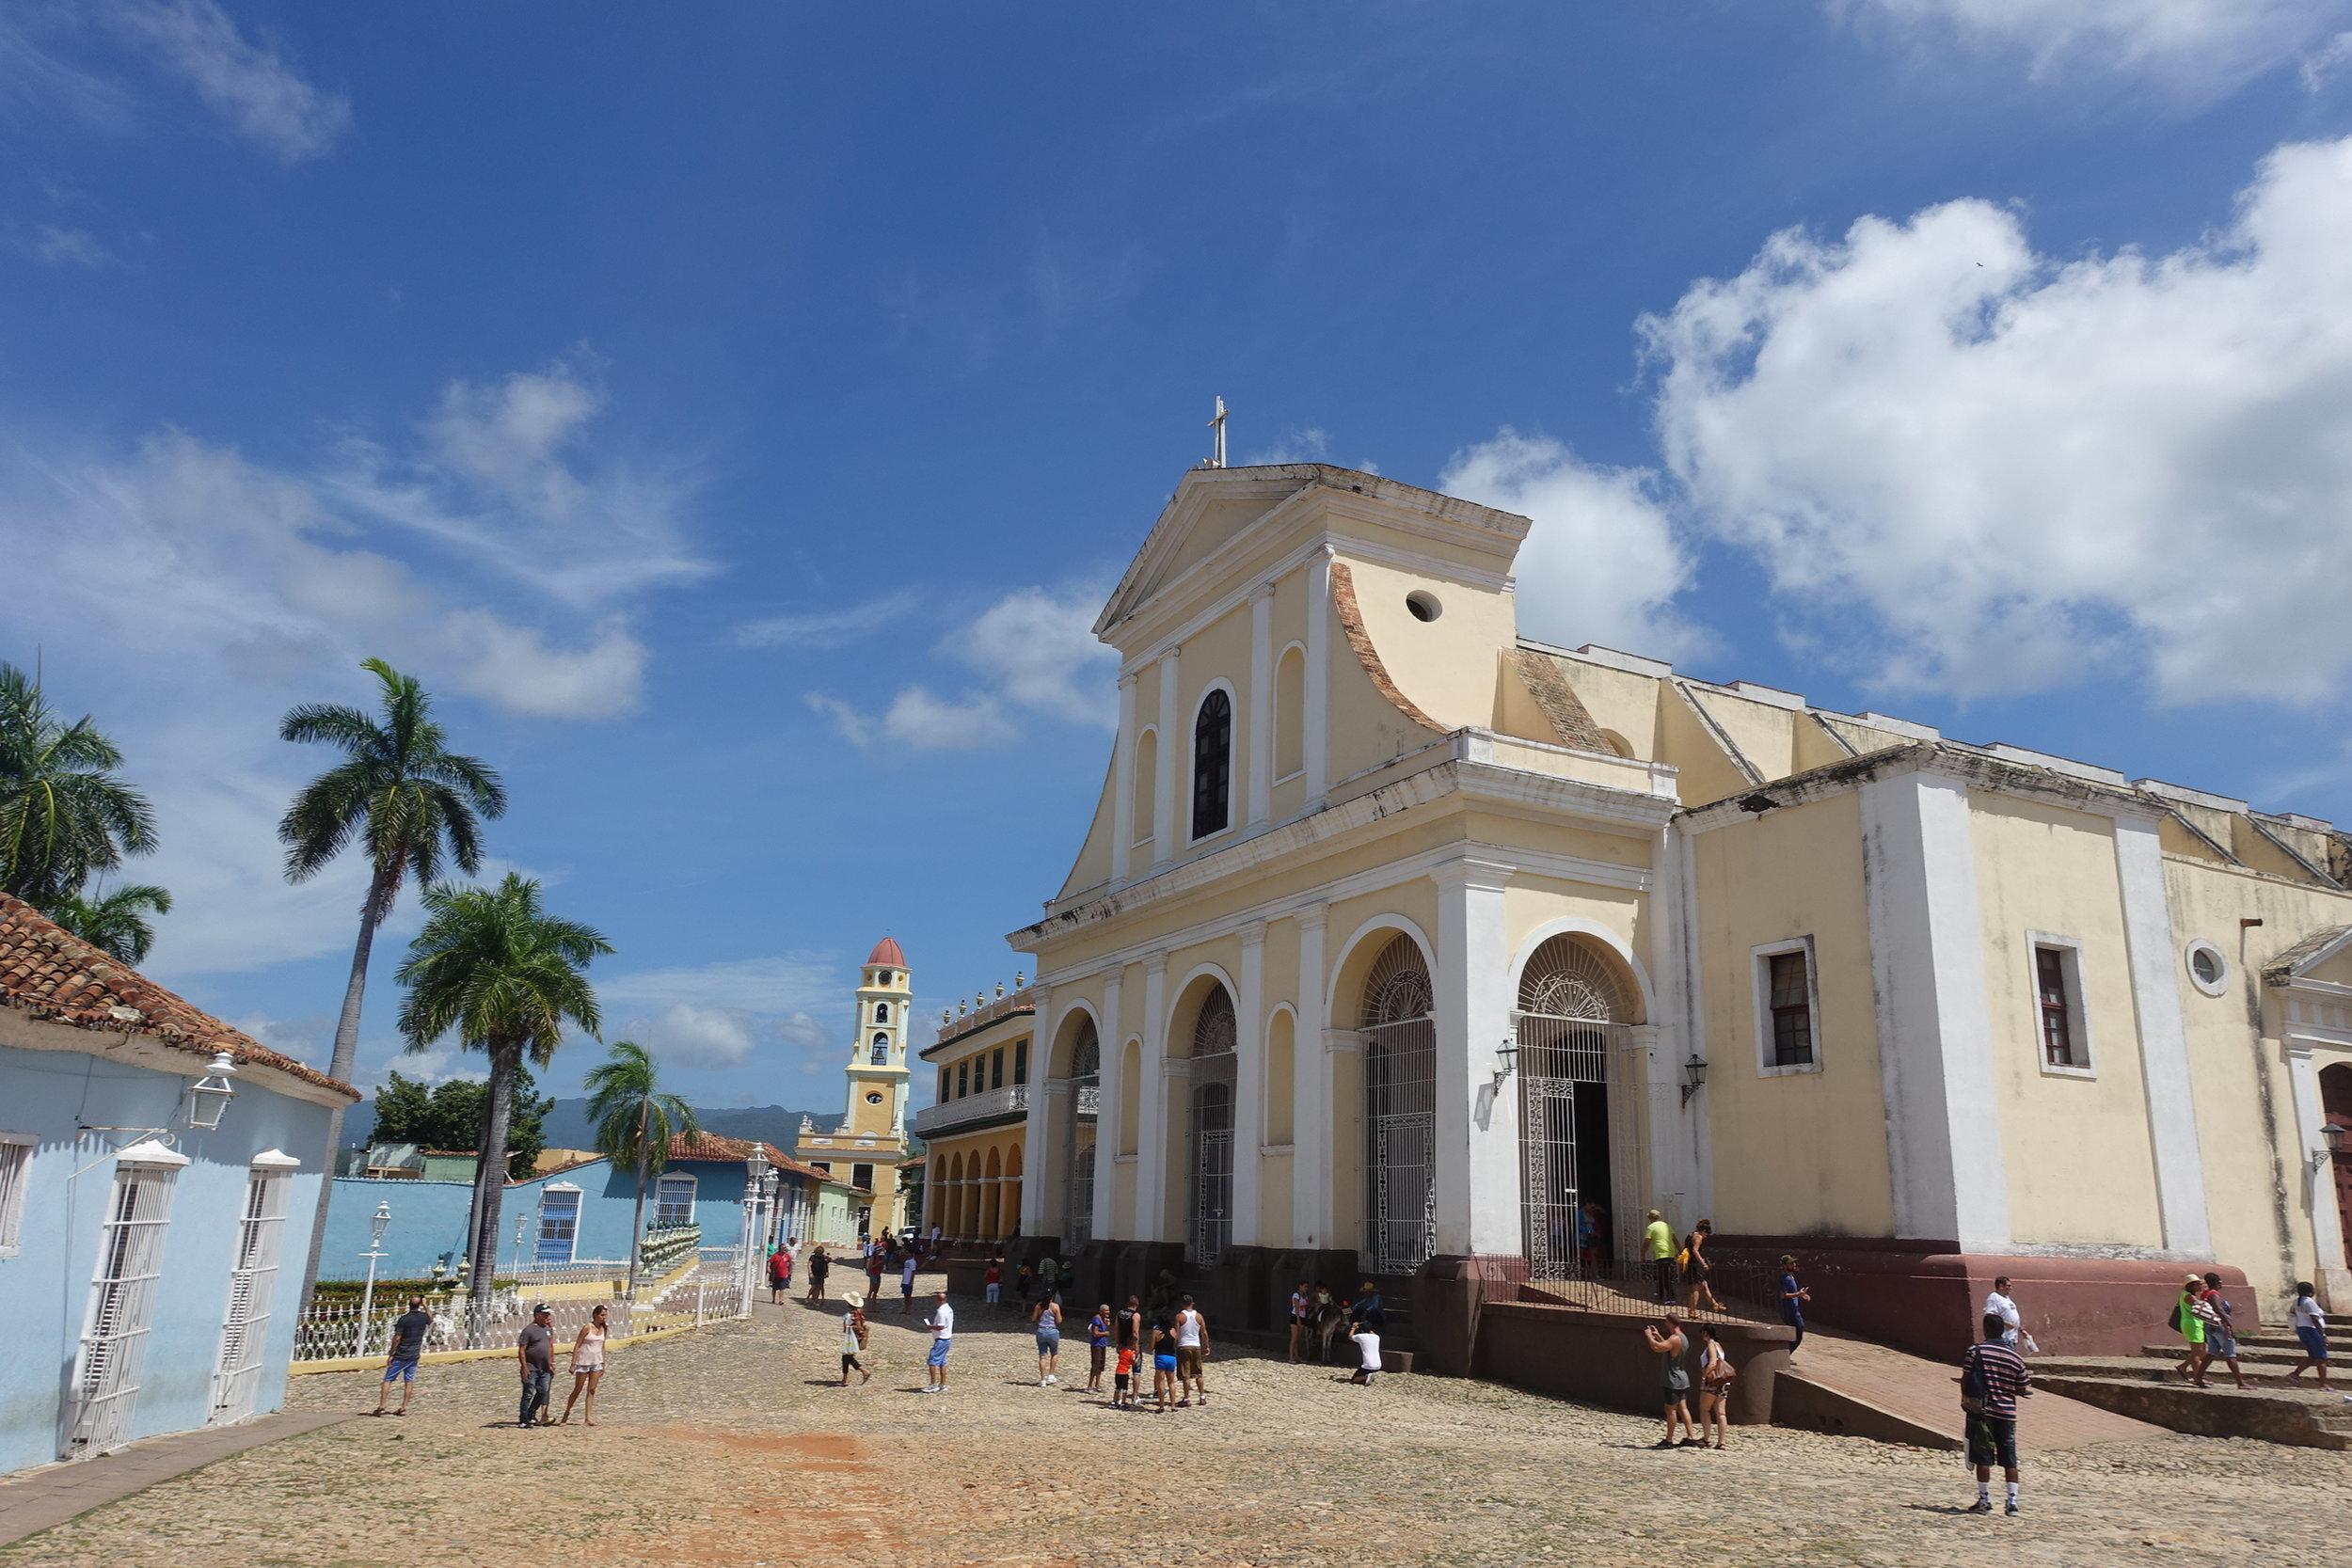 iglesia parroquial de la santisima trinidad